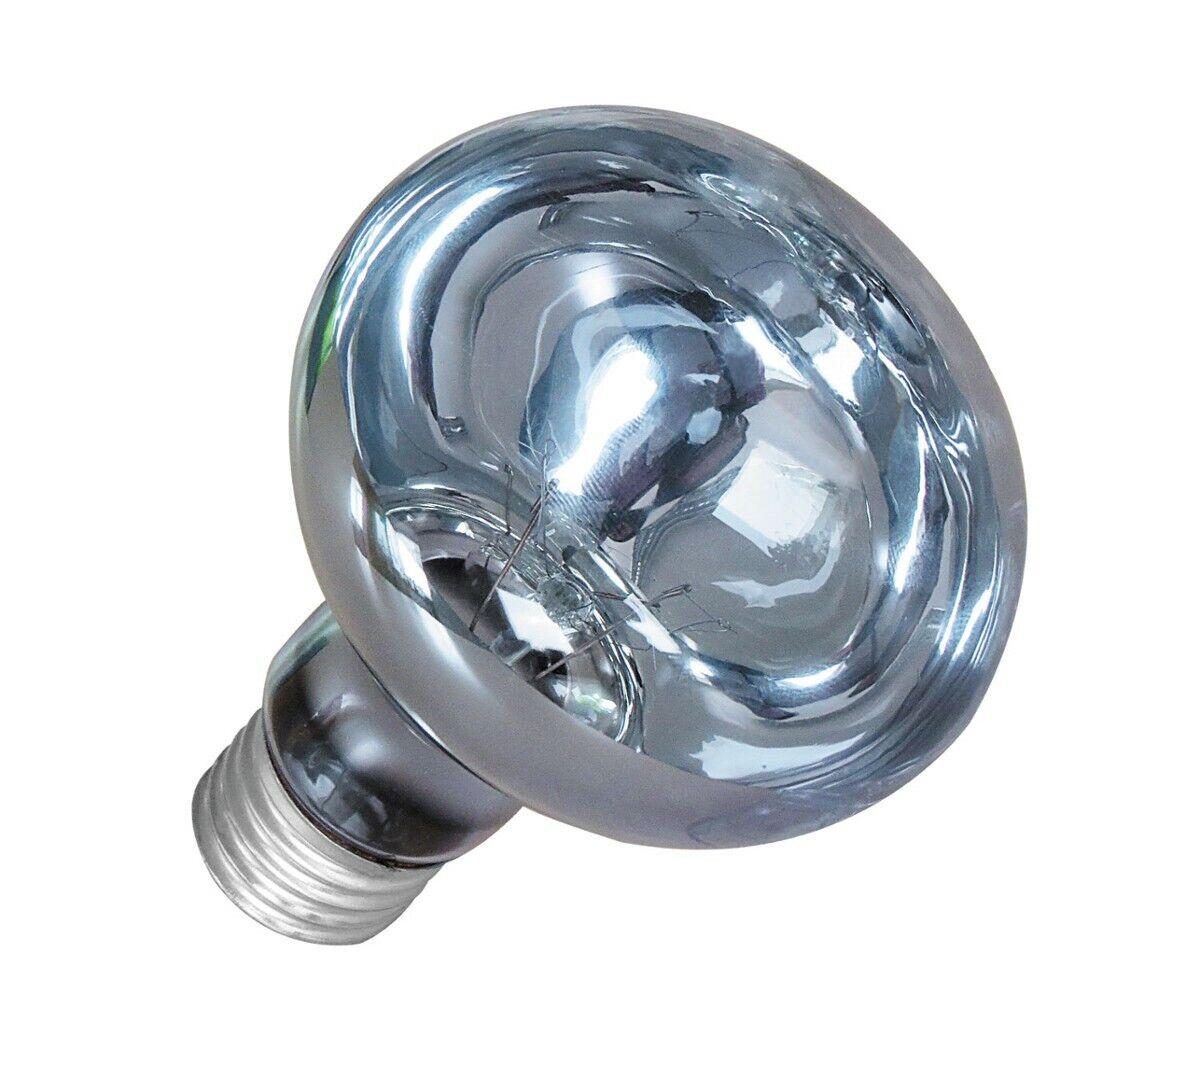 Wärmelampe Wärmestrahler Lampe Glühbirne Weißlampe Terrarium 25-100 Watt E27